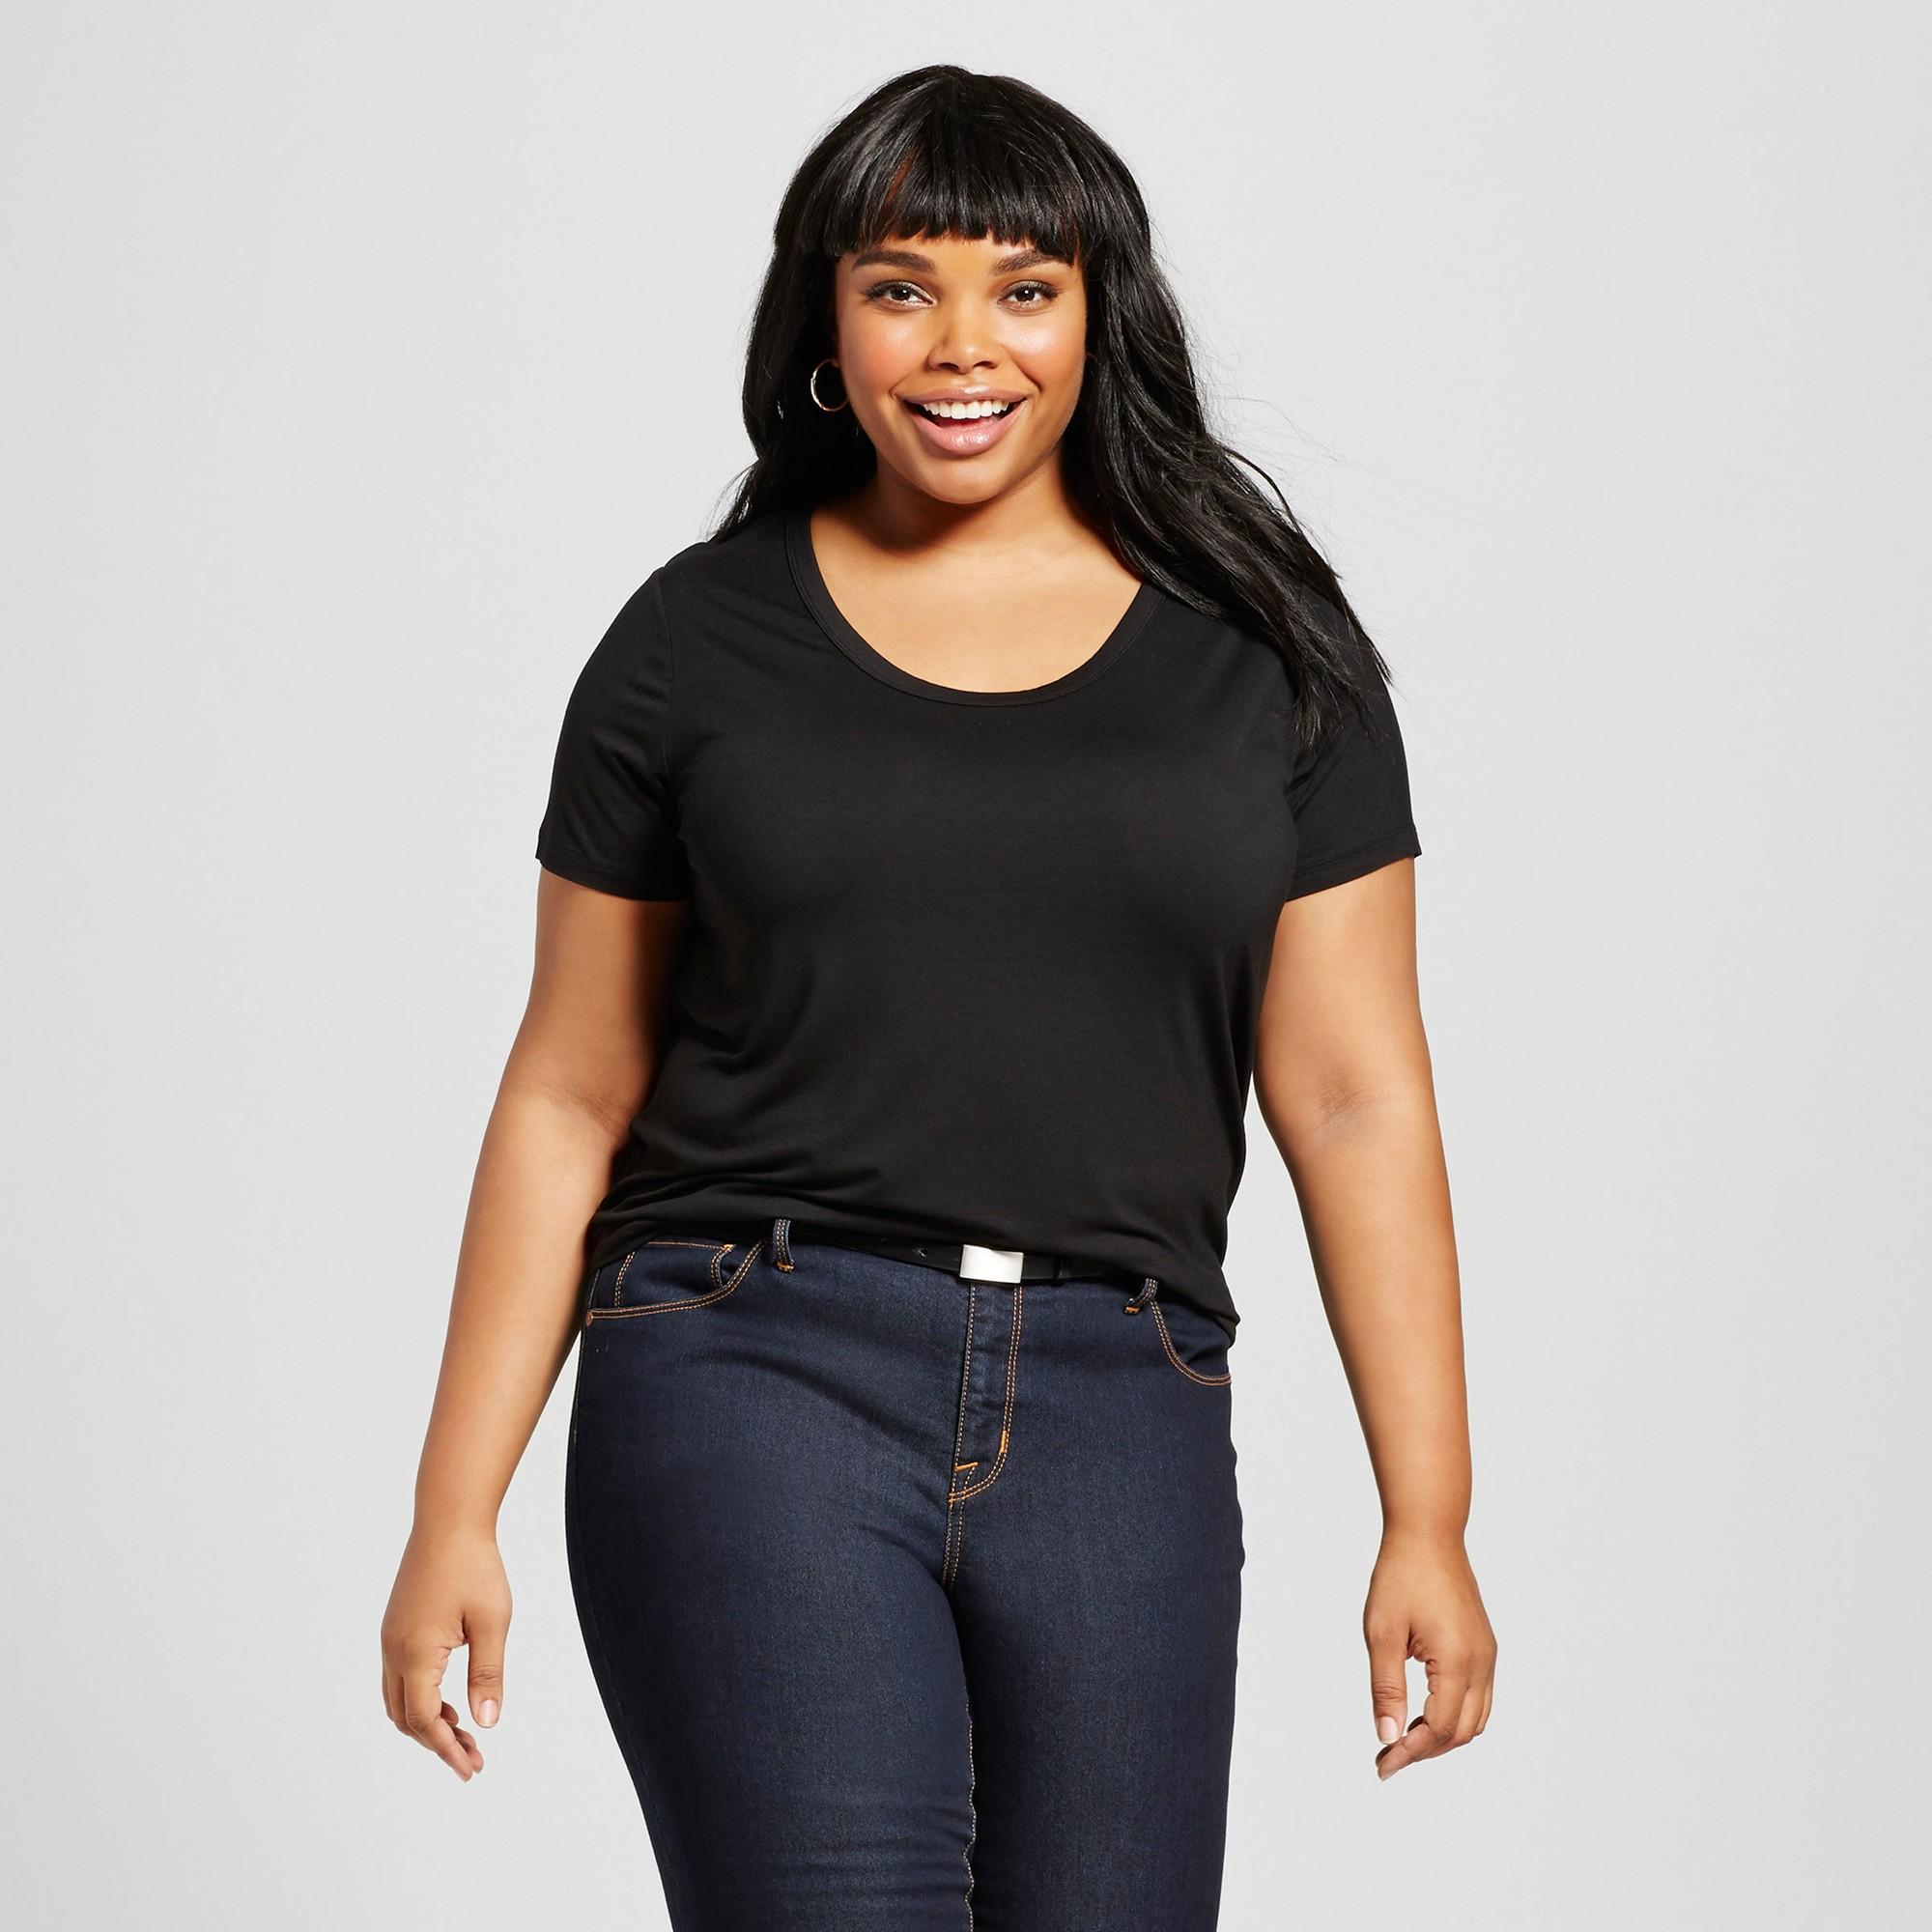 bb07b21be7 Women s Plus Size Perfect T-Shirt - Ava   Viv Black 4X